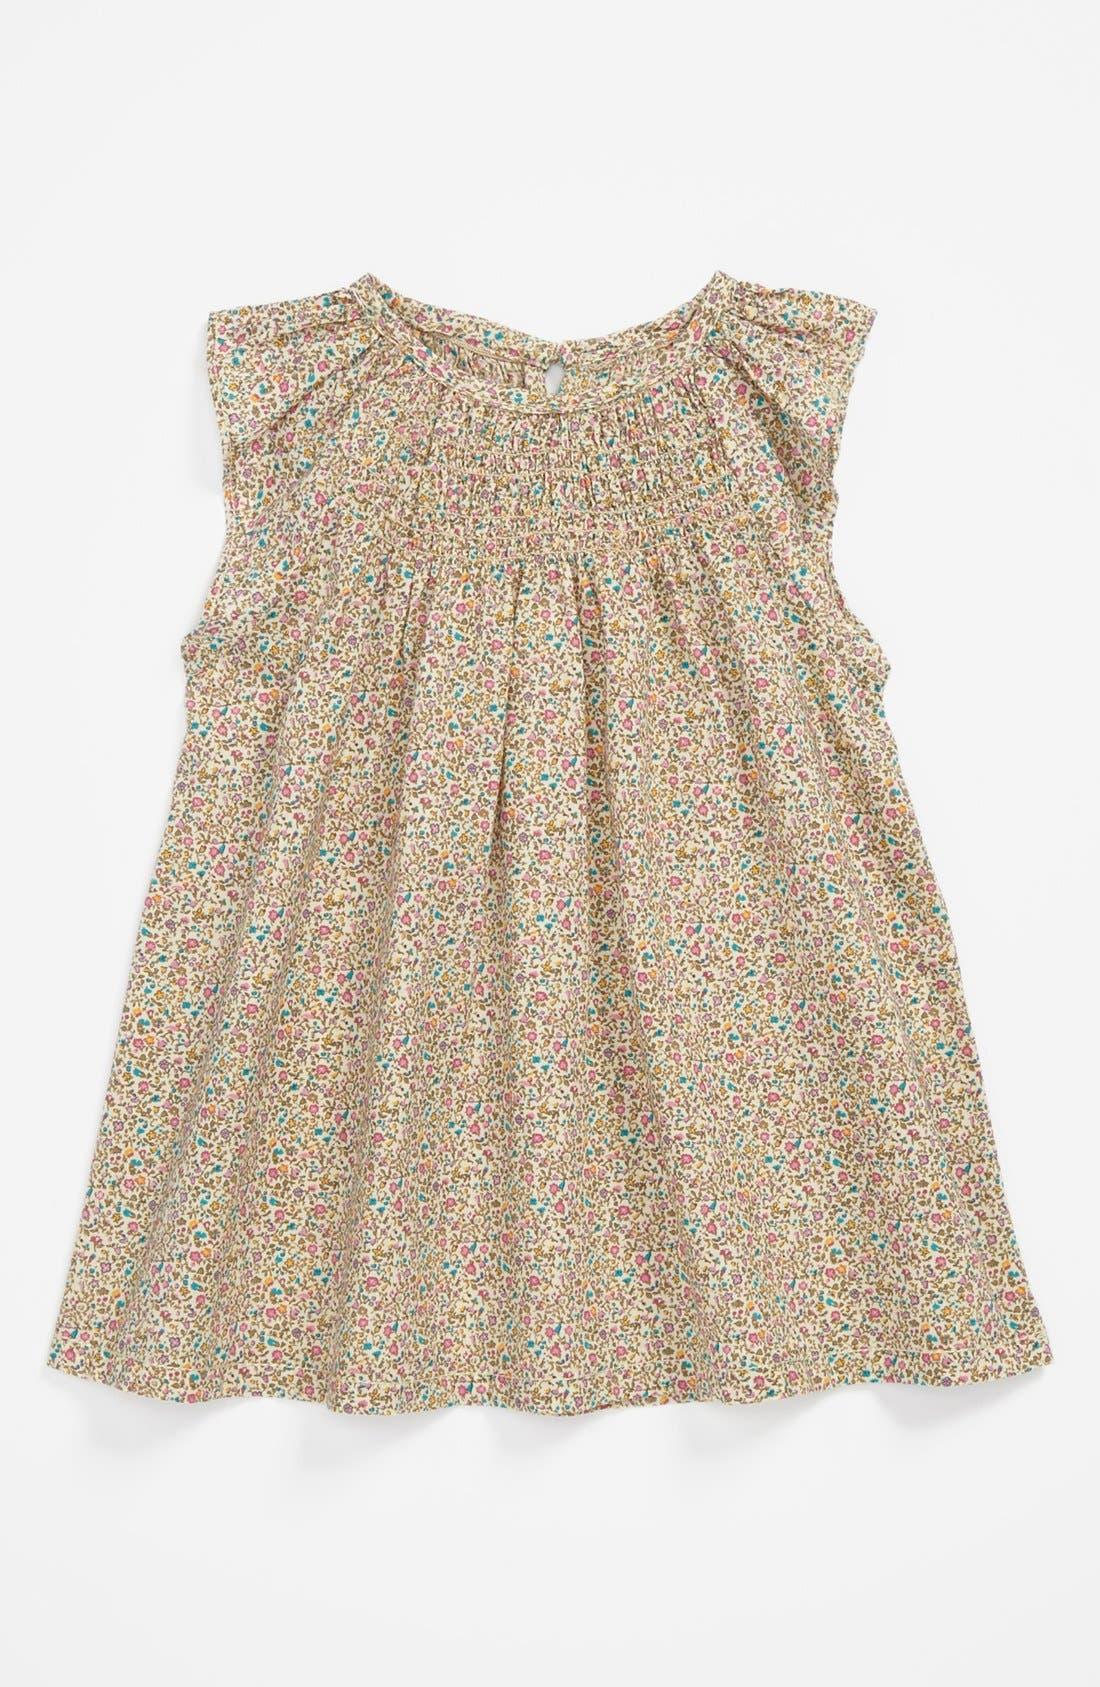 Main Image - Peek 'Magnolia' Top (Baby Girls)